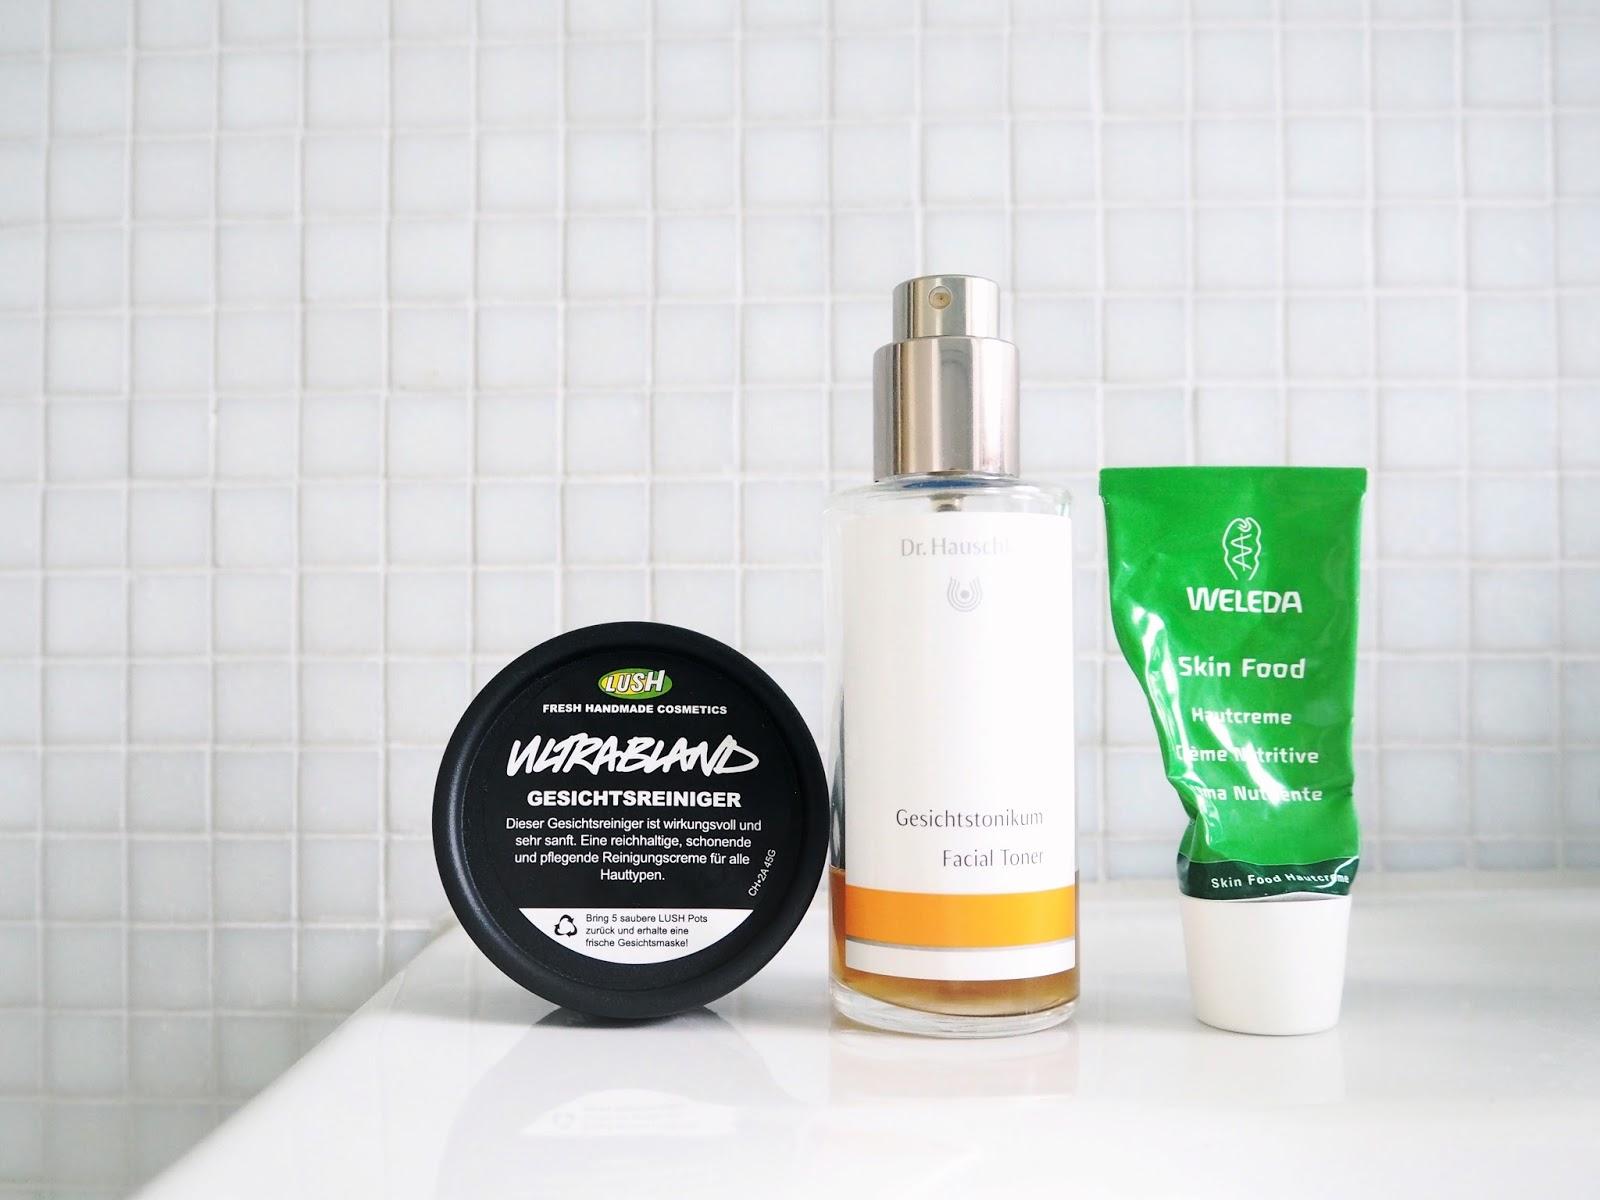 My Minimal Morning Skincare Routine, minimal skincare, cleanser, lush ultrabland, toner, dr hauschka, facial toner, moisturiser, weleda, skin food, review